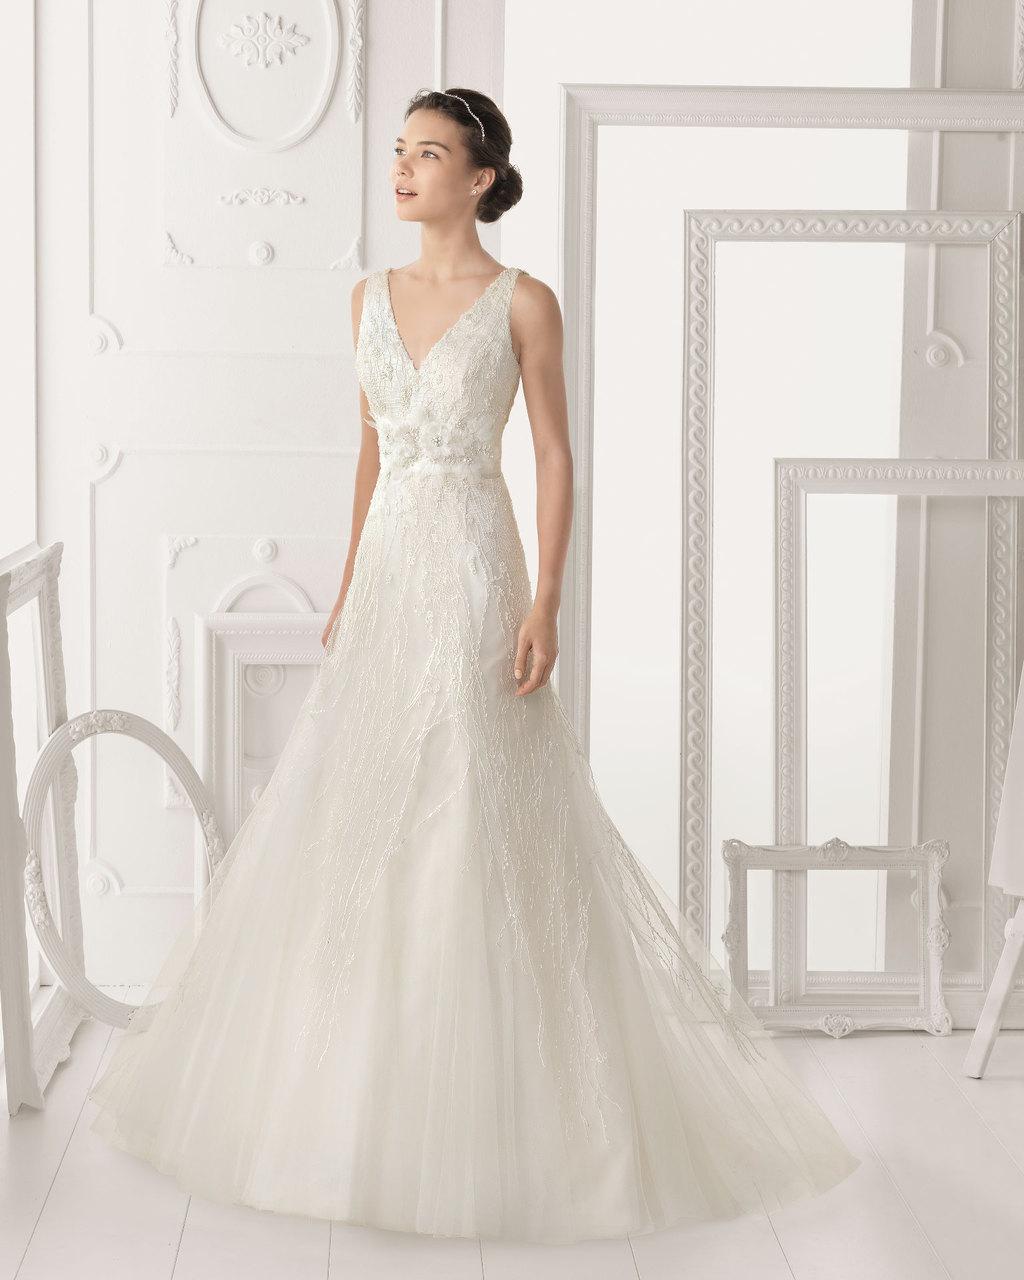 Aire-barcelona-wedding-dress-2014-bridal-olimpia.full